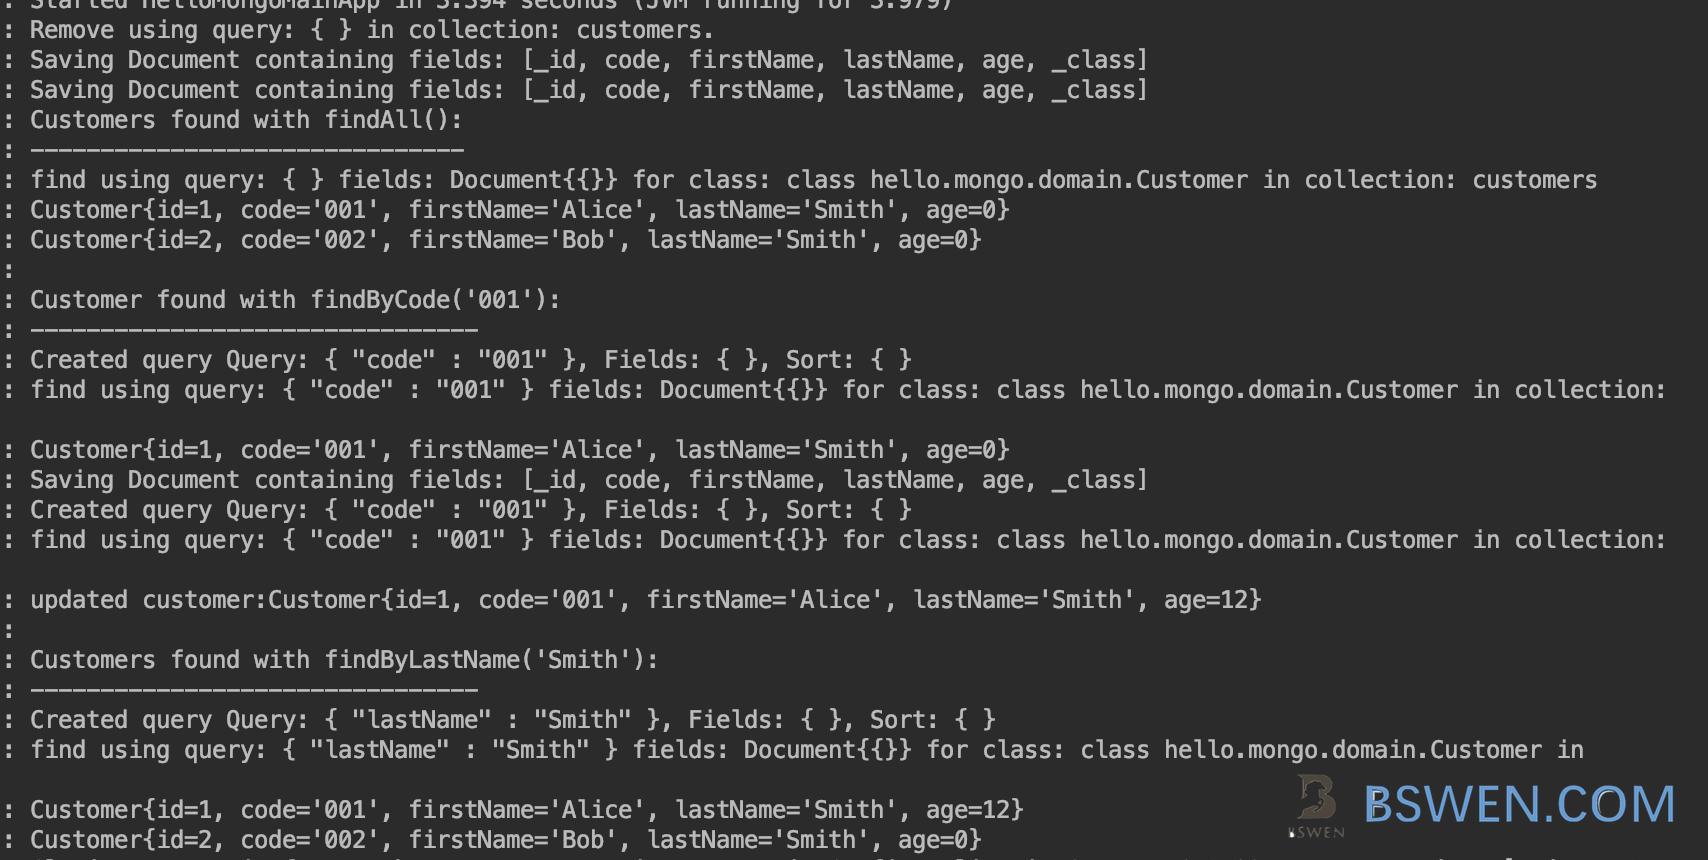 springboot-SpringBoot 2 and mongodb CRUD example